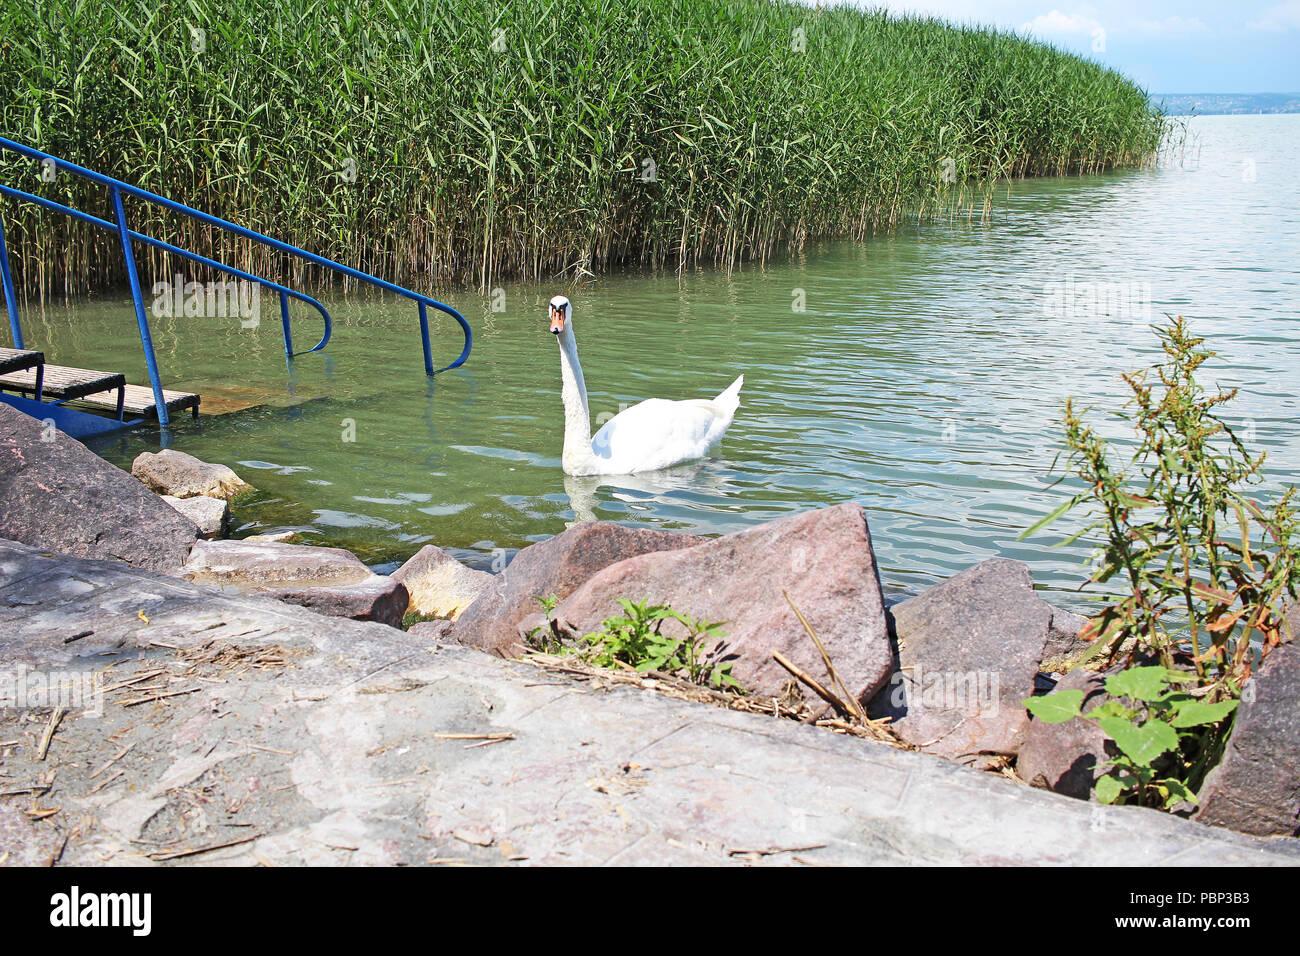 Hungary Balaton Tihany european lake 2018 Hungarian summer. sunny day. - Stock Image